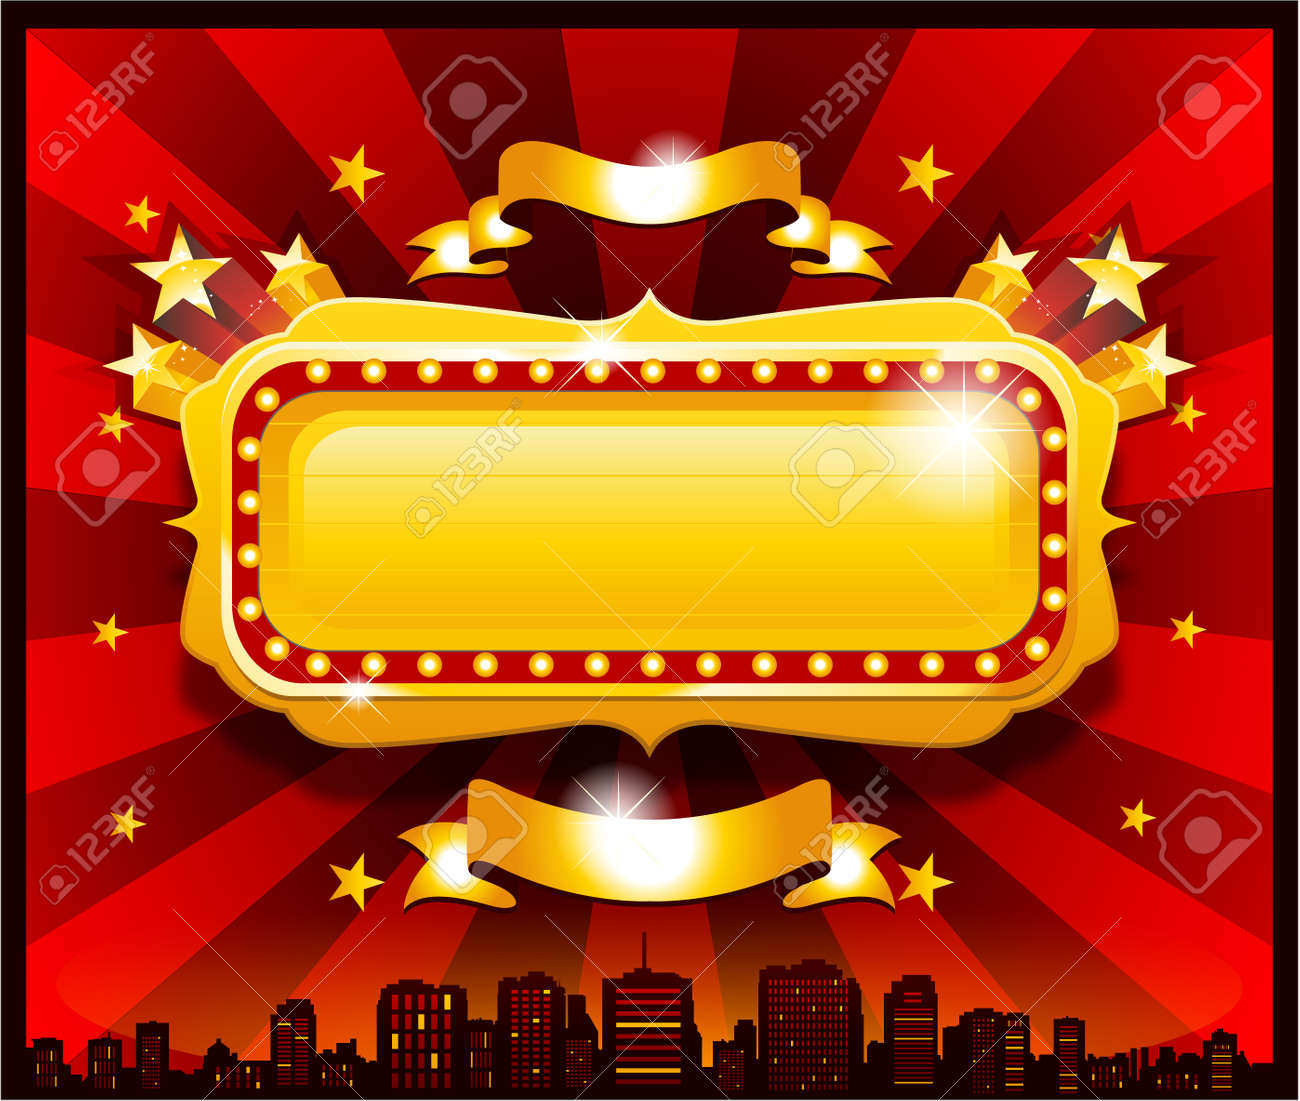 Vintage golden circus casino banner - 33513083